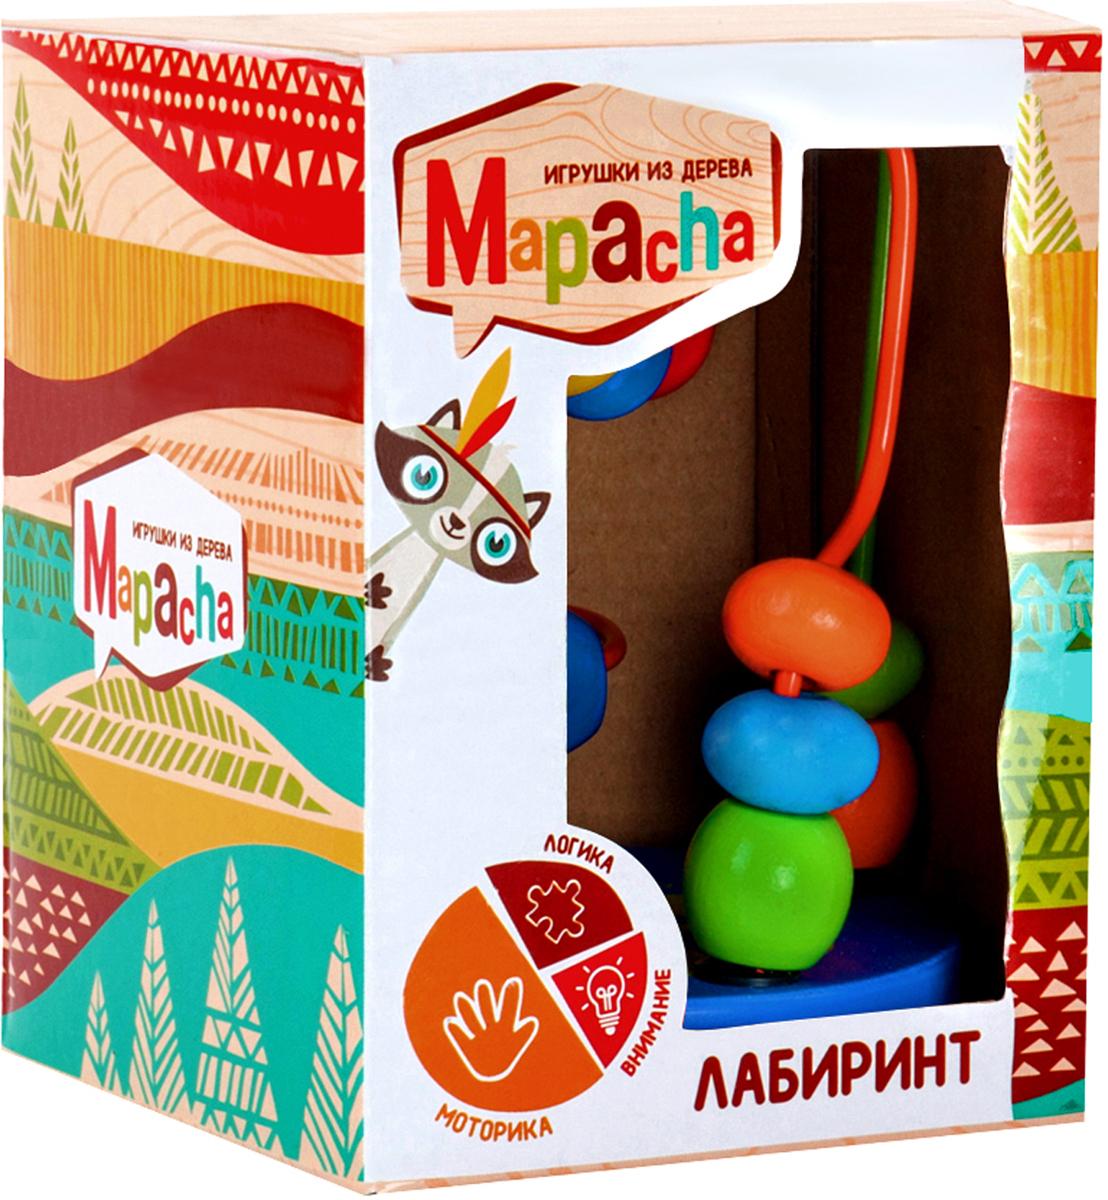 Mapacha Лабиринт цвет синий деревянные игрушки mapacha рамка лабиринт кошки мышки